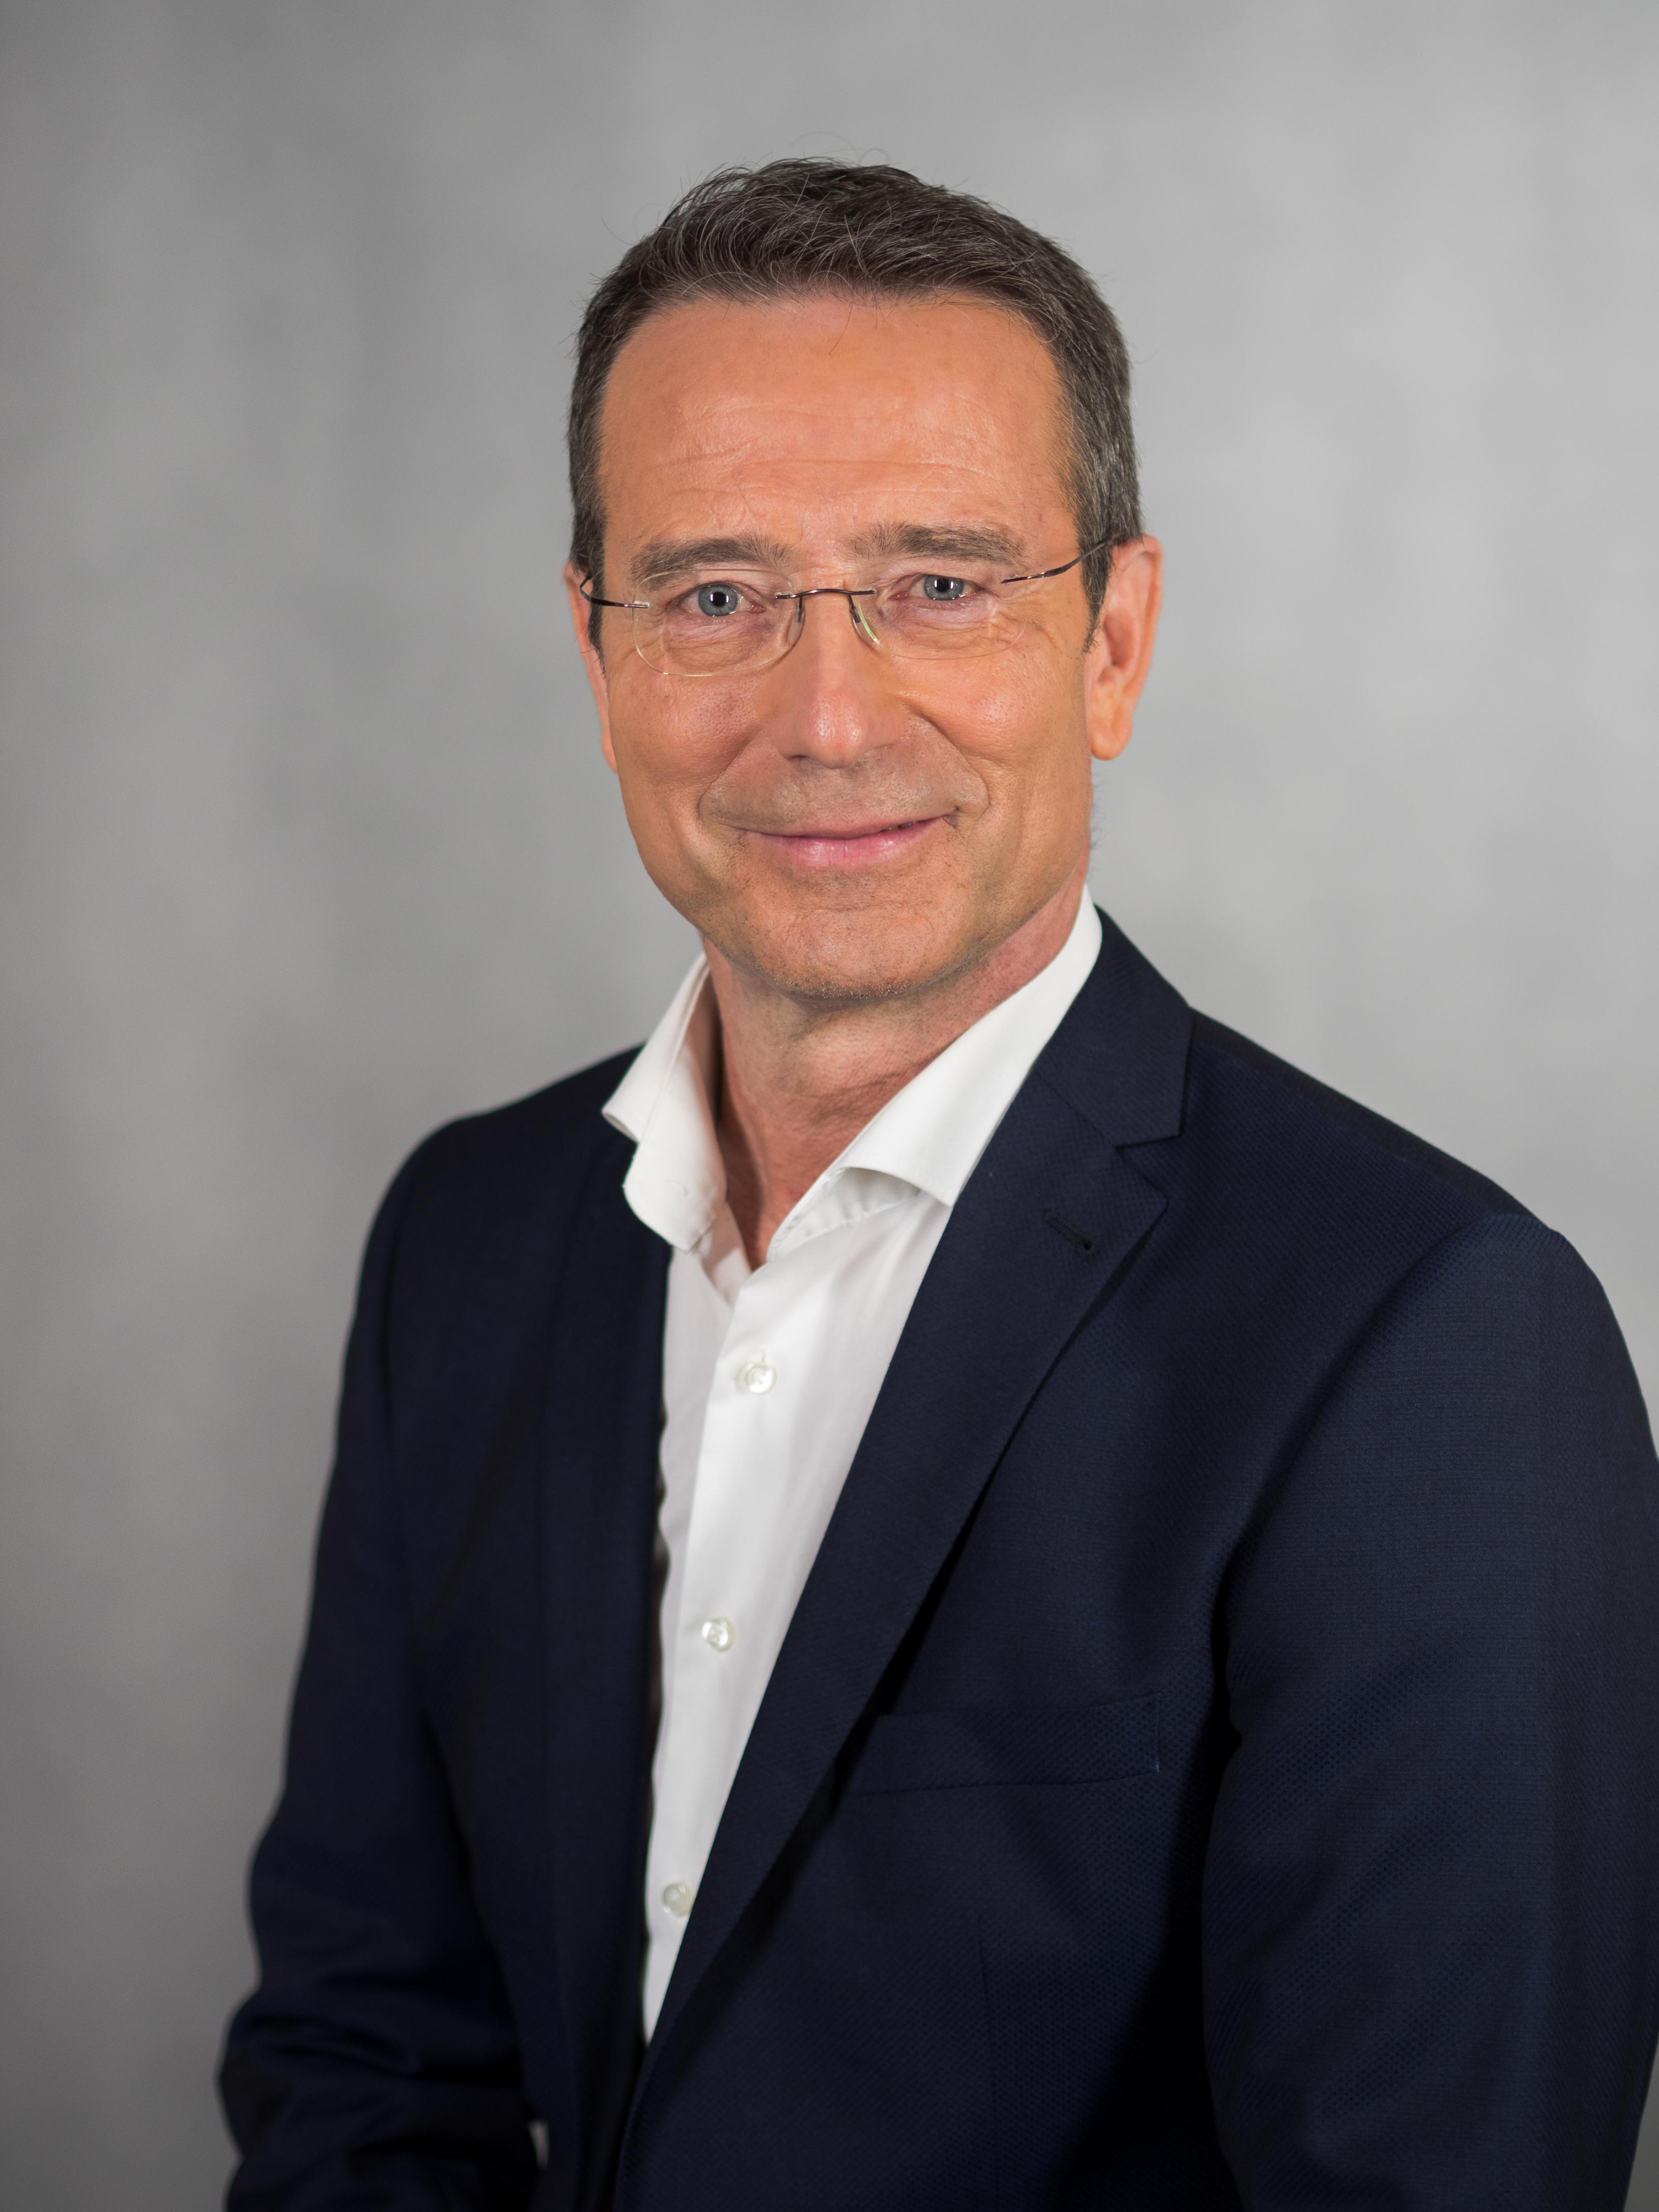 Matthias Riedl Wikipedia